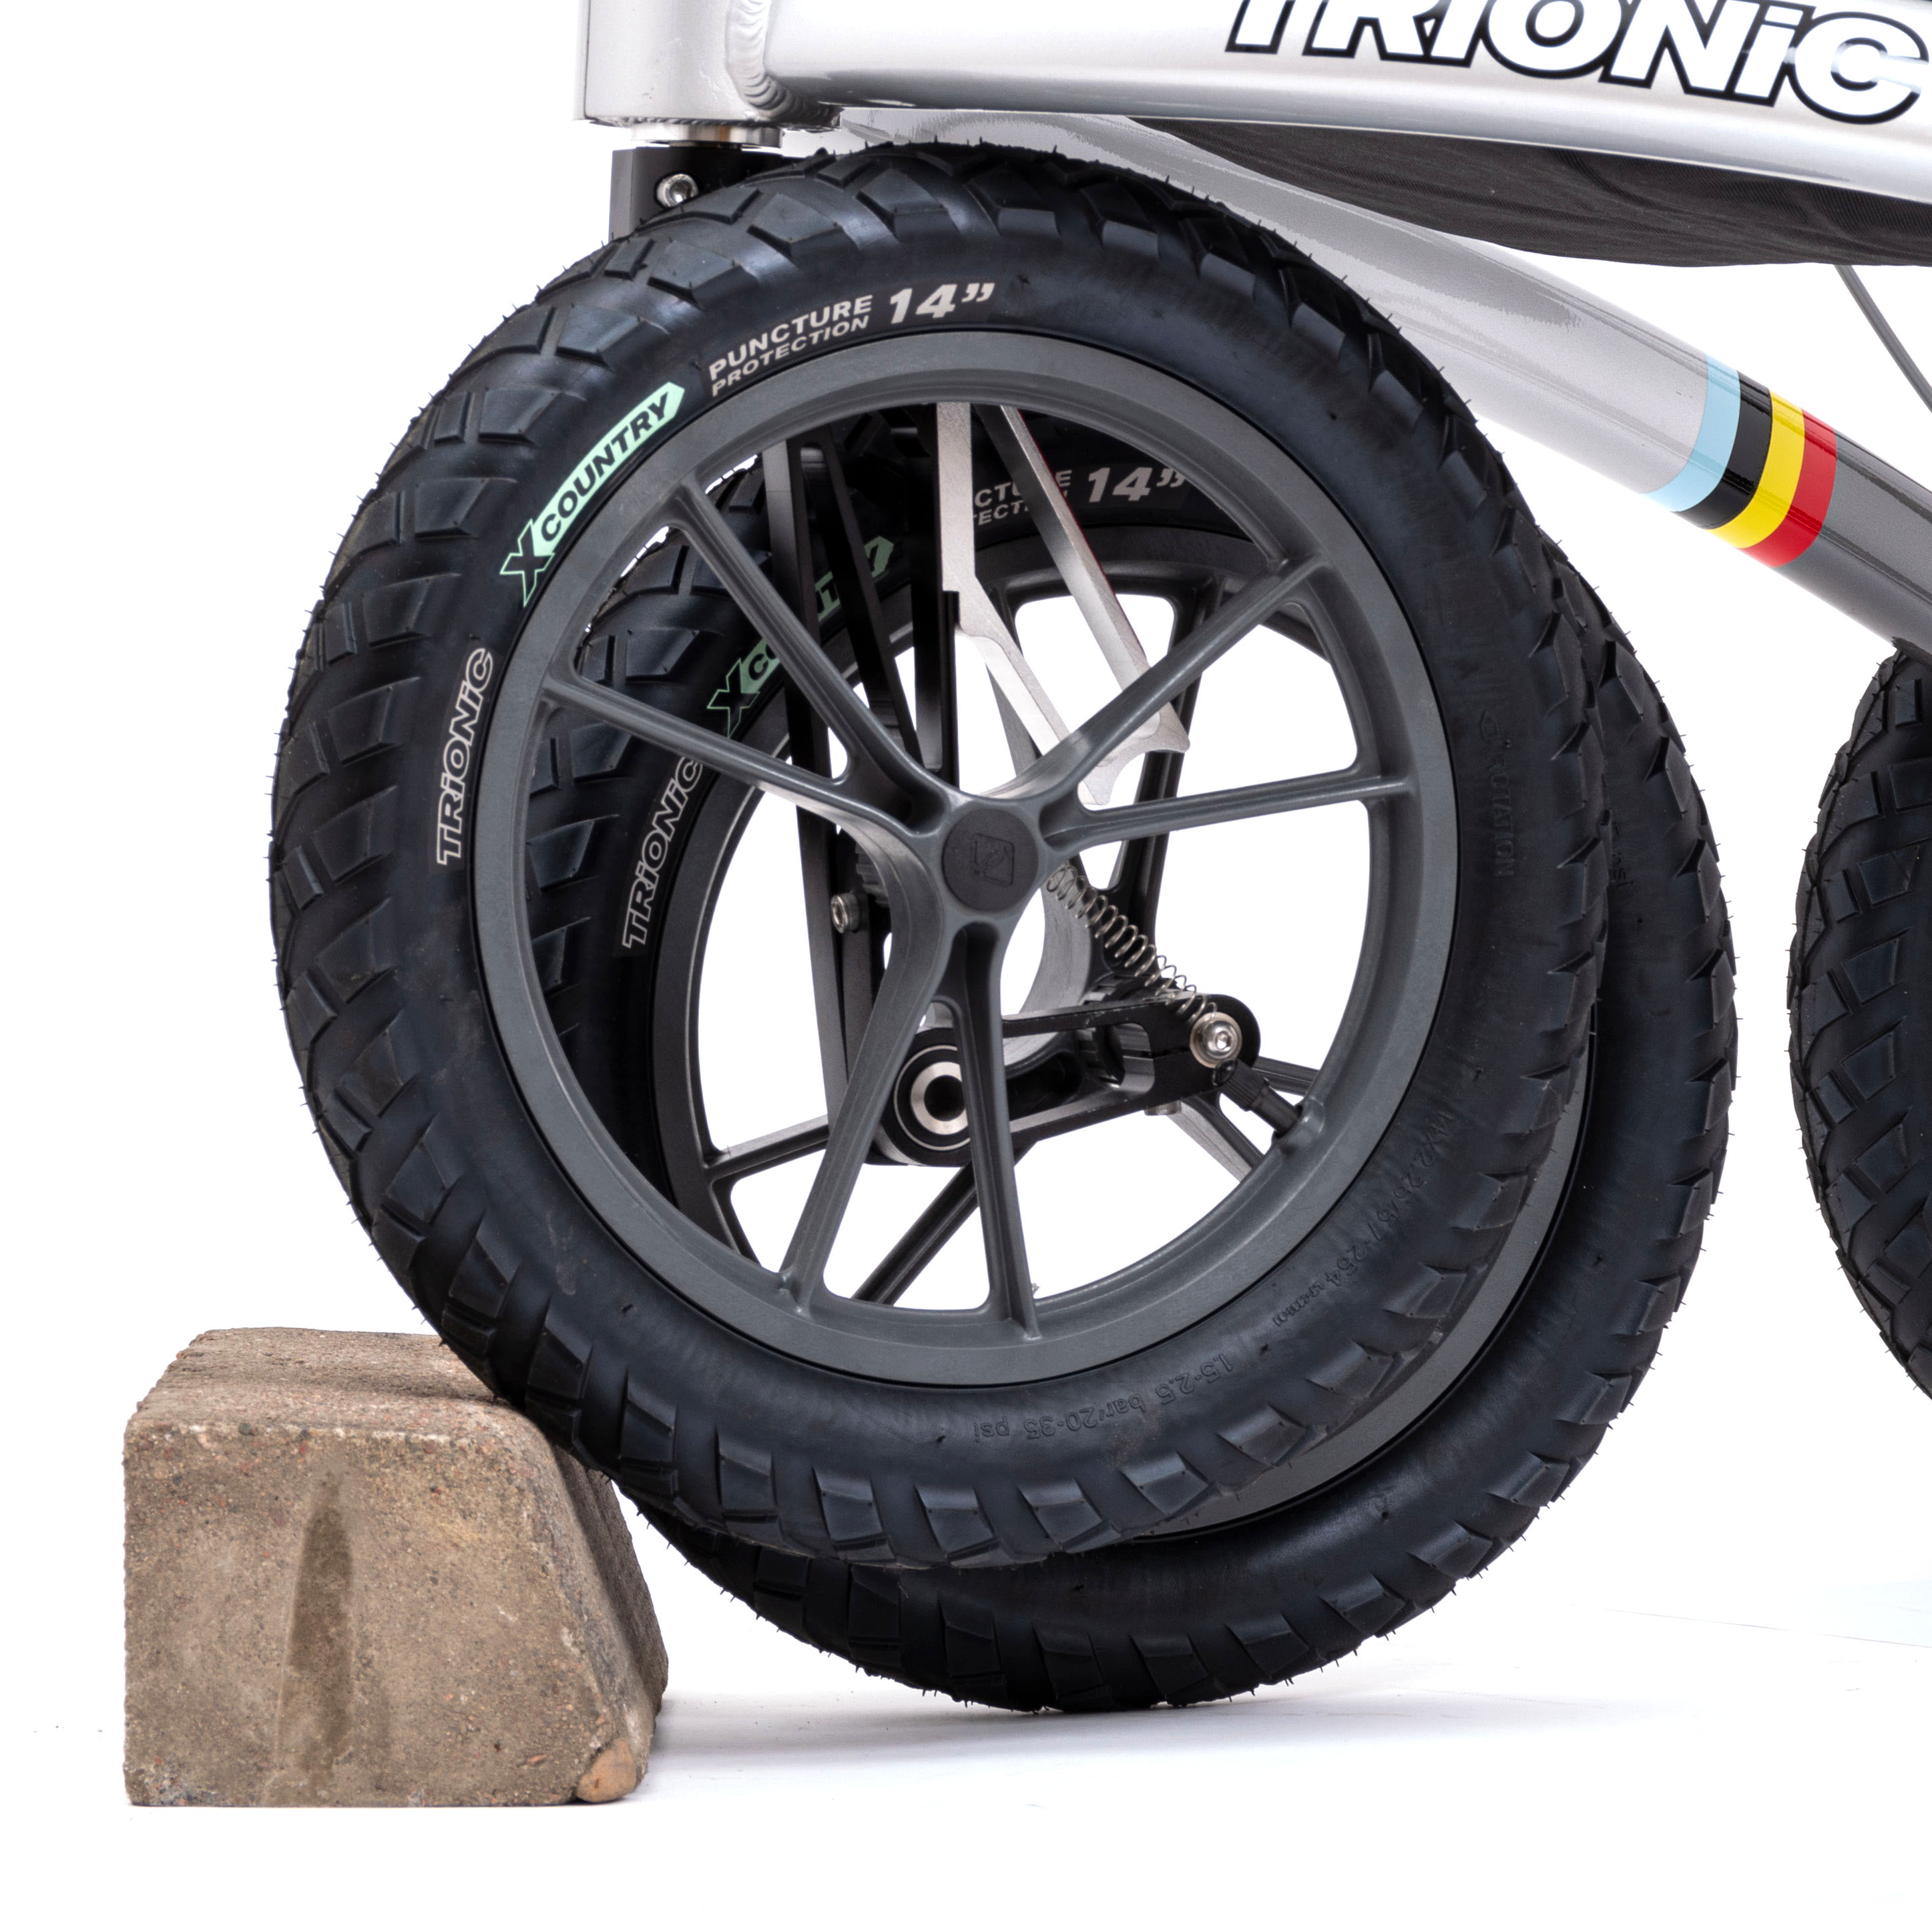 La taille de la roue importe